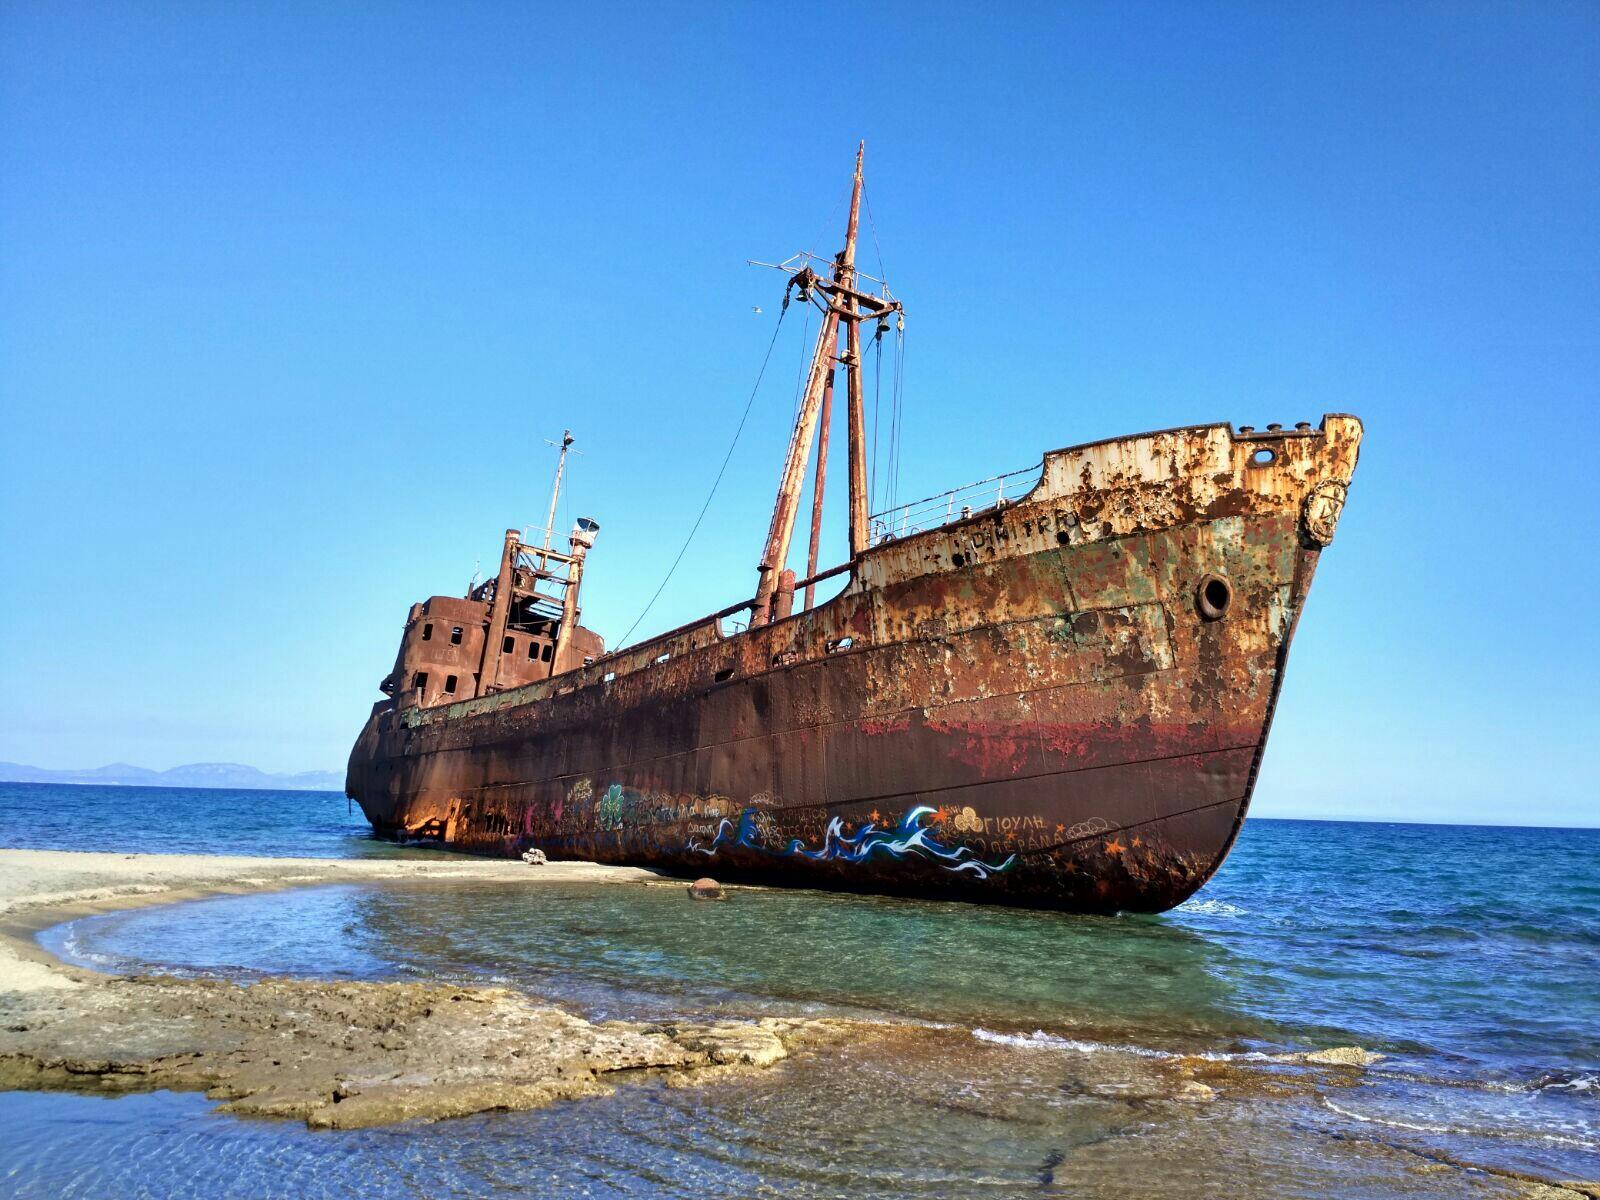 A rusty shipwreck in gytheion, greece | Abandoned | Pinterest ...